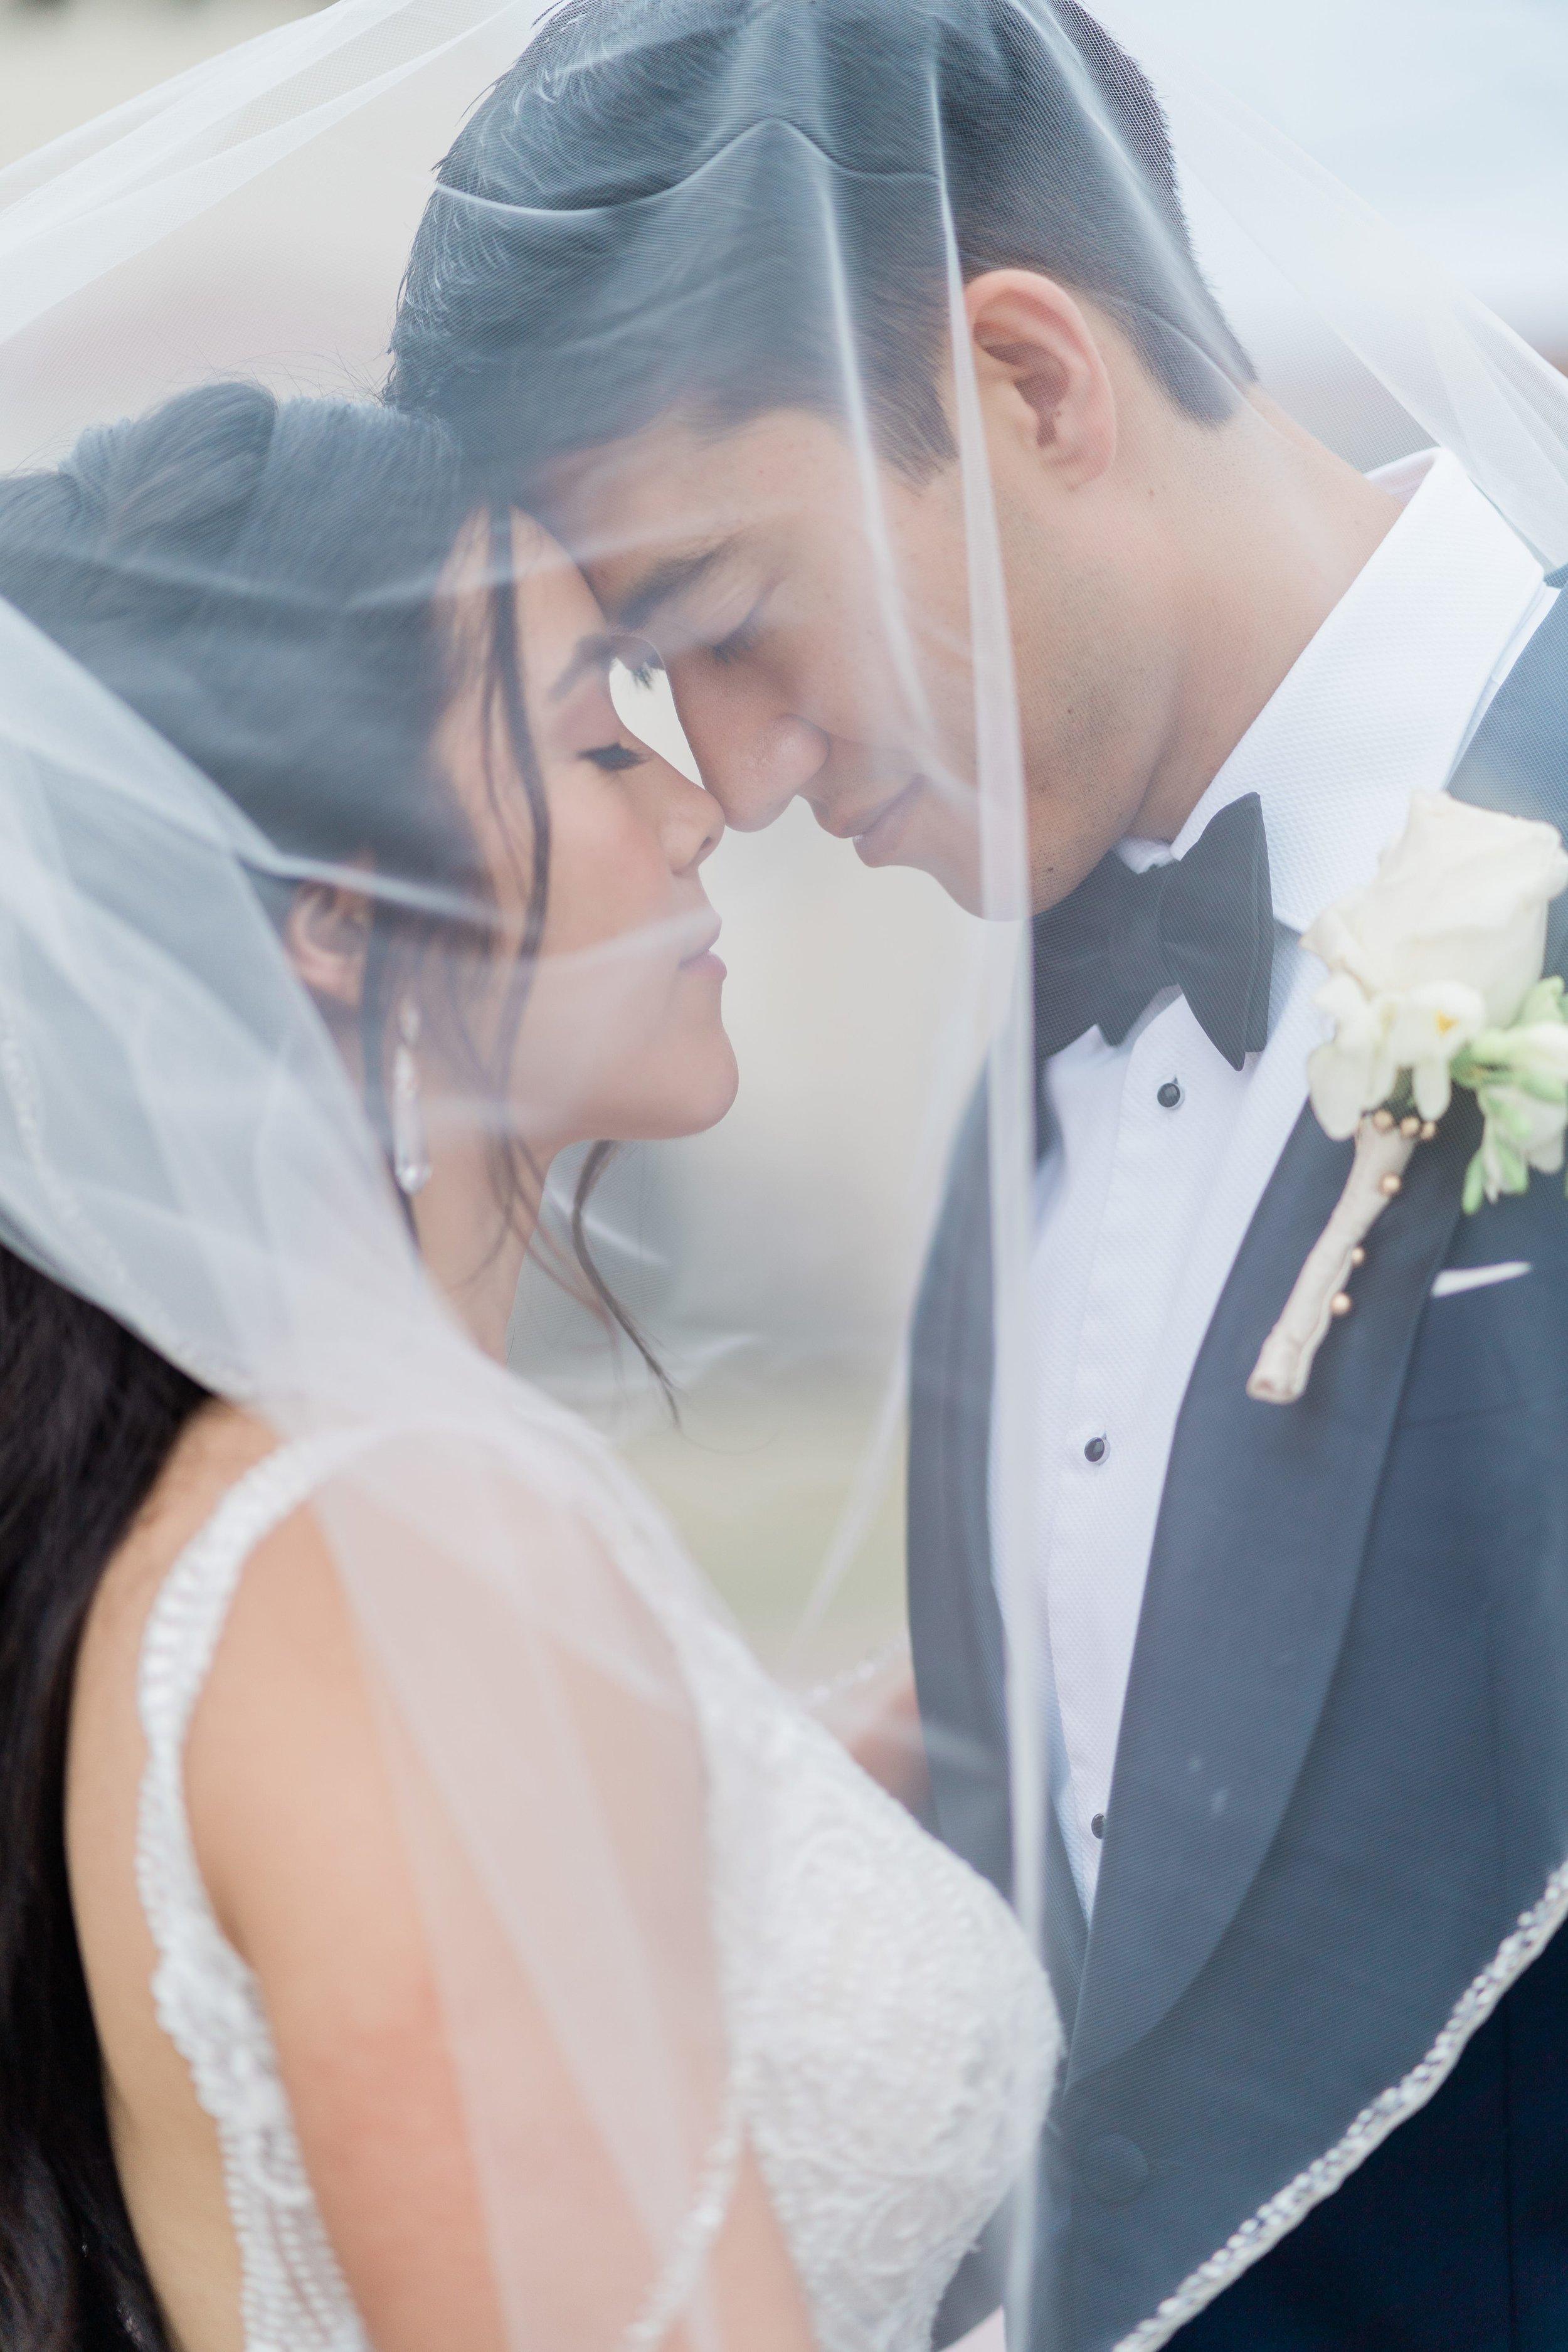 naval-postgraduate-school-wedding-in-monterey-ca-drew-zavala-photo-bobby-briana-1-min.jpg